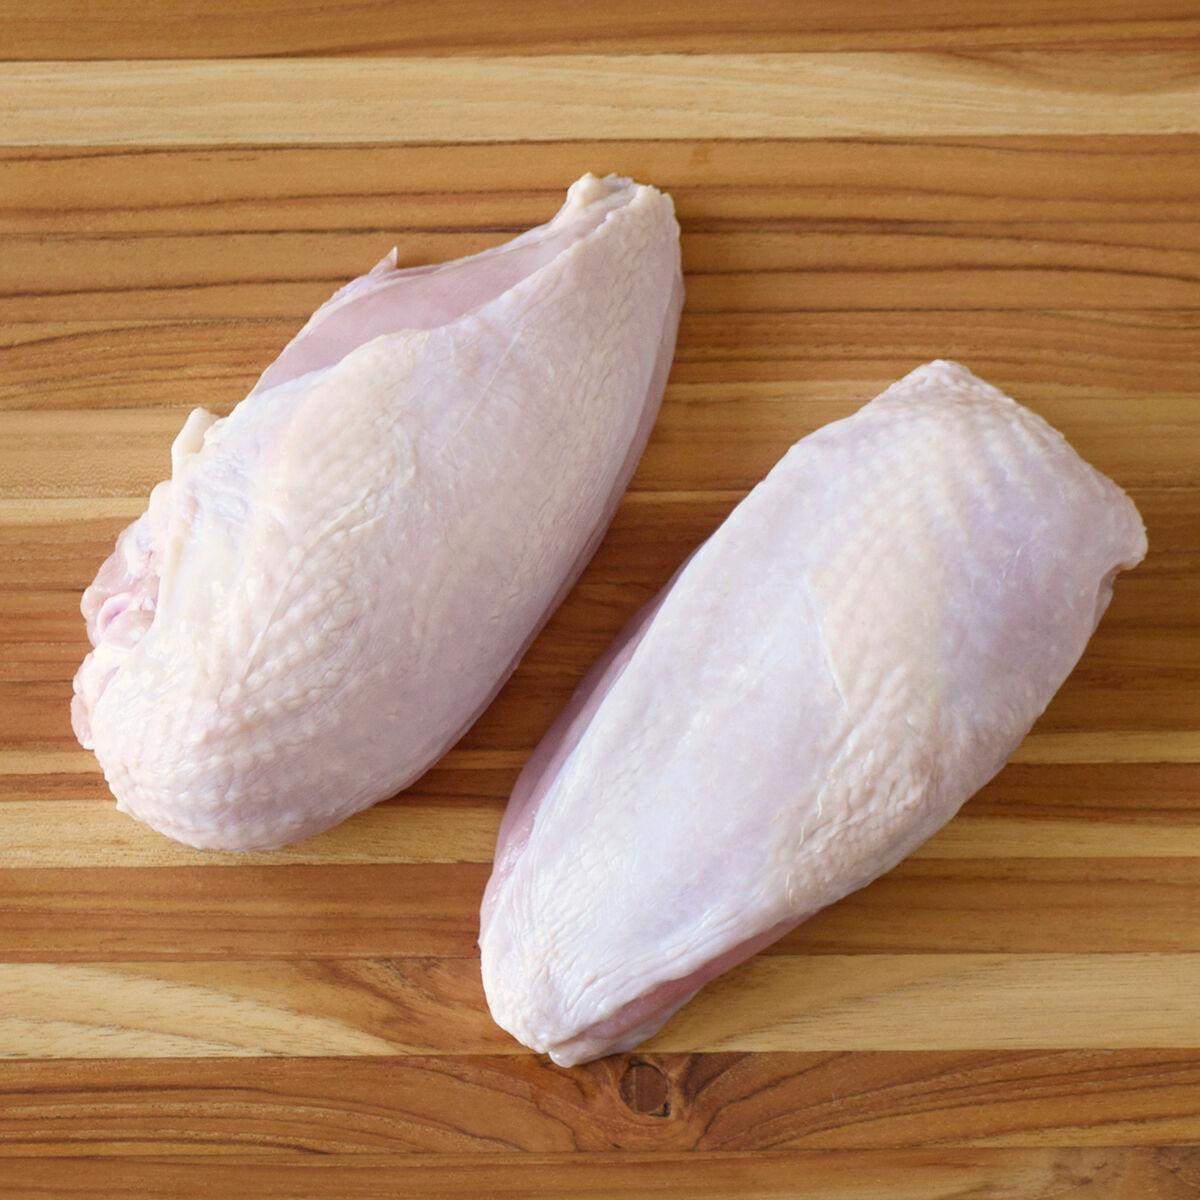 D'Artagnan Organic Chicken Breasts, Split: Fresh (11.25 - 13lb case 9 1.25-1.5lbs avg packs avg. each)  by D'Artagnan